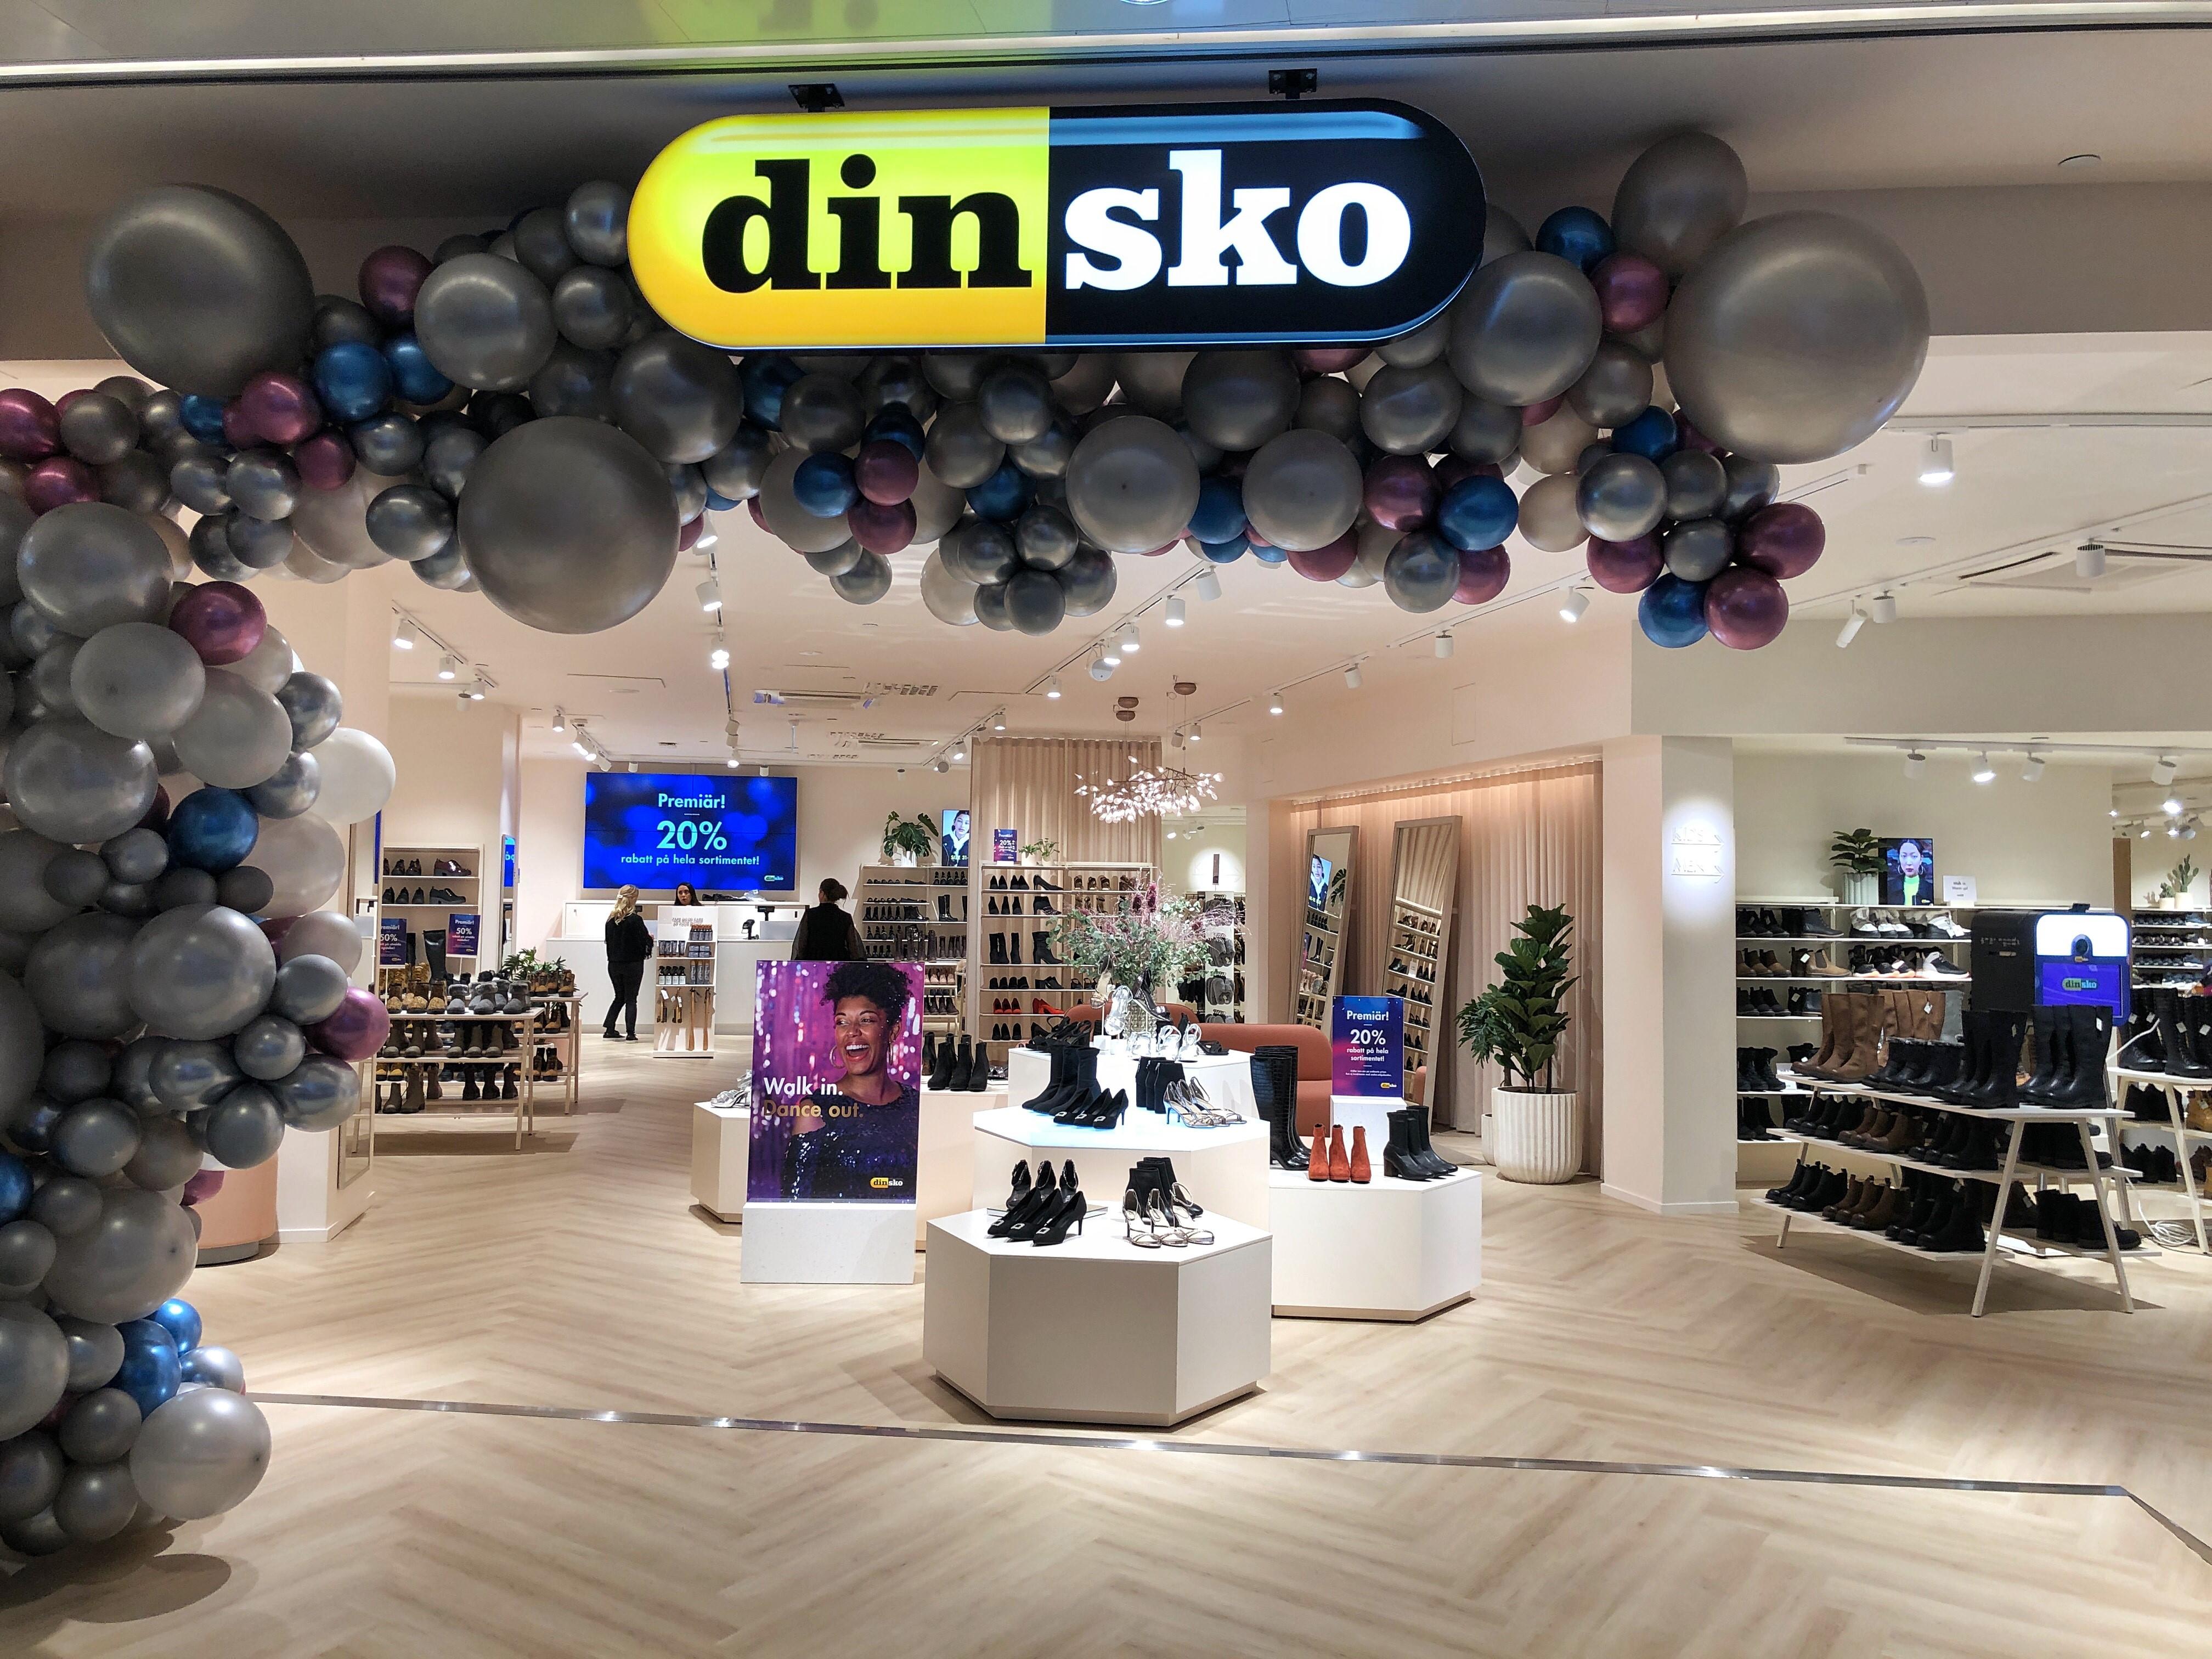 DinSko öppnar nytt flaggskepp i Gallerian NilsonGroup